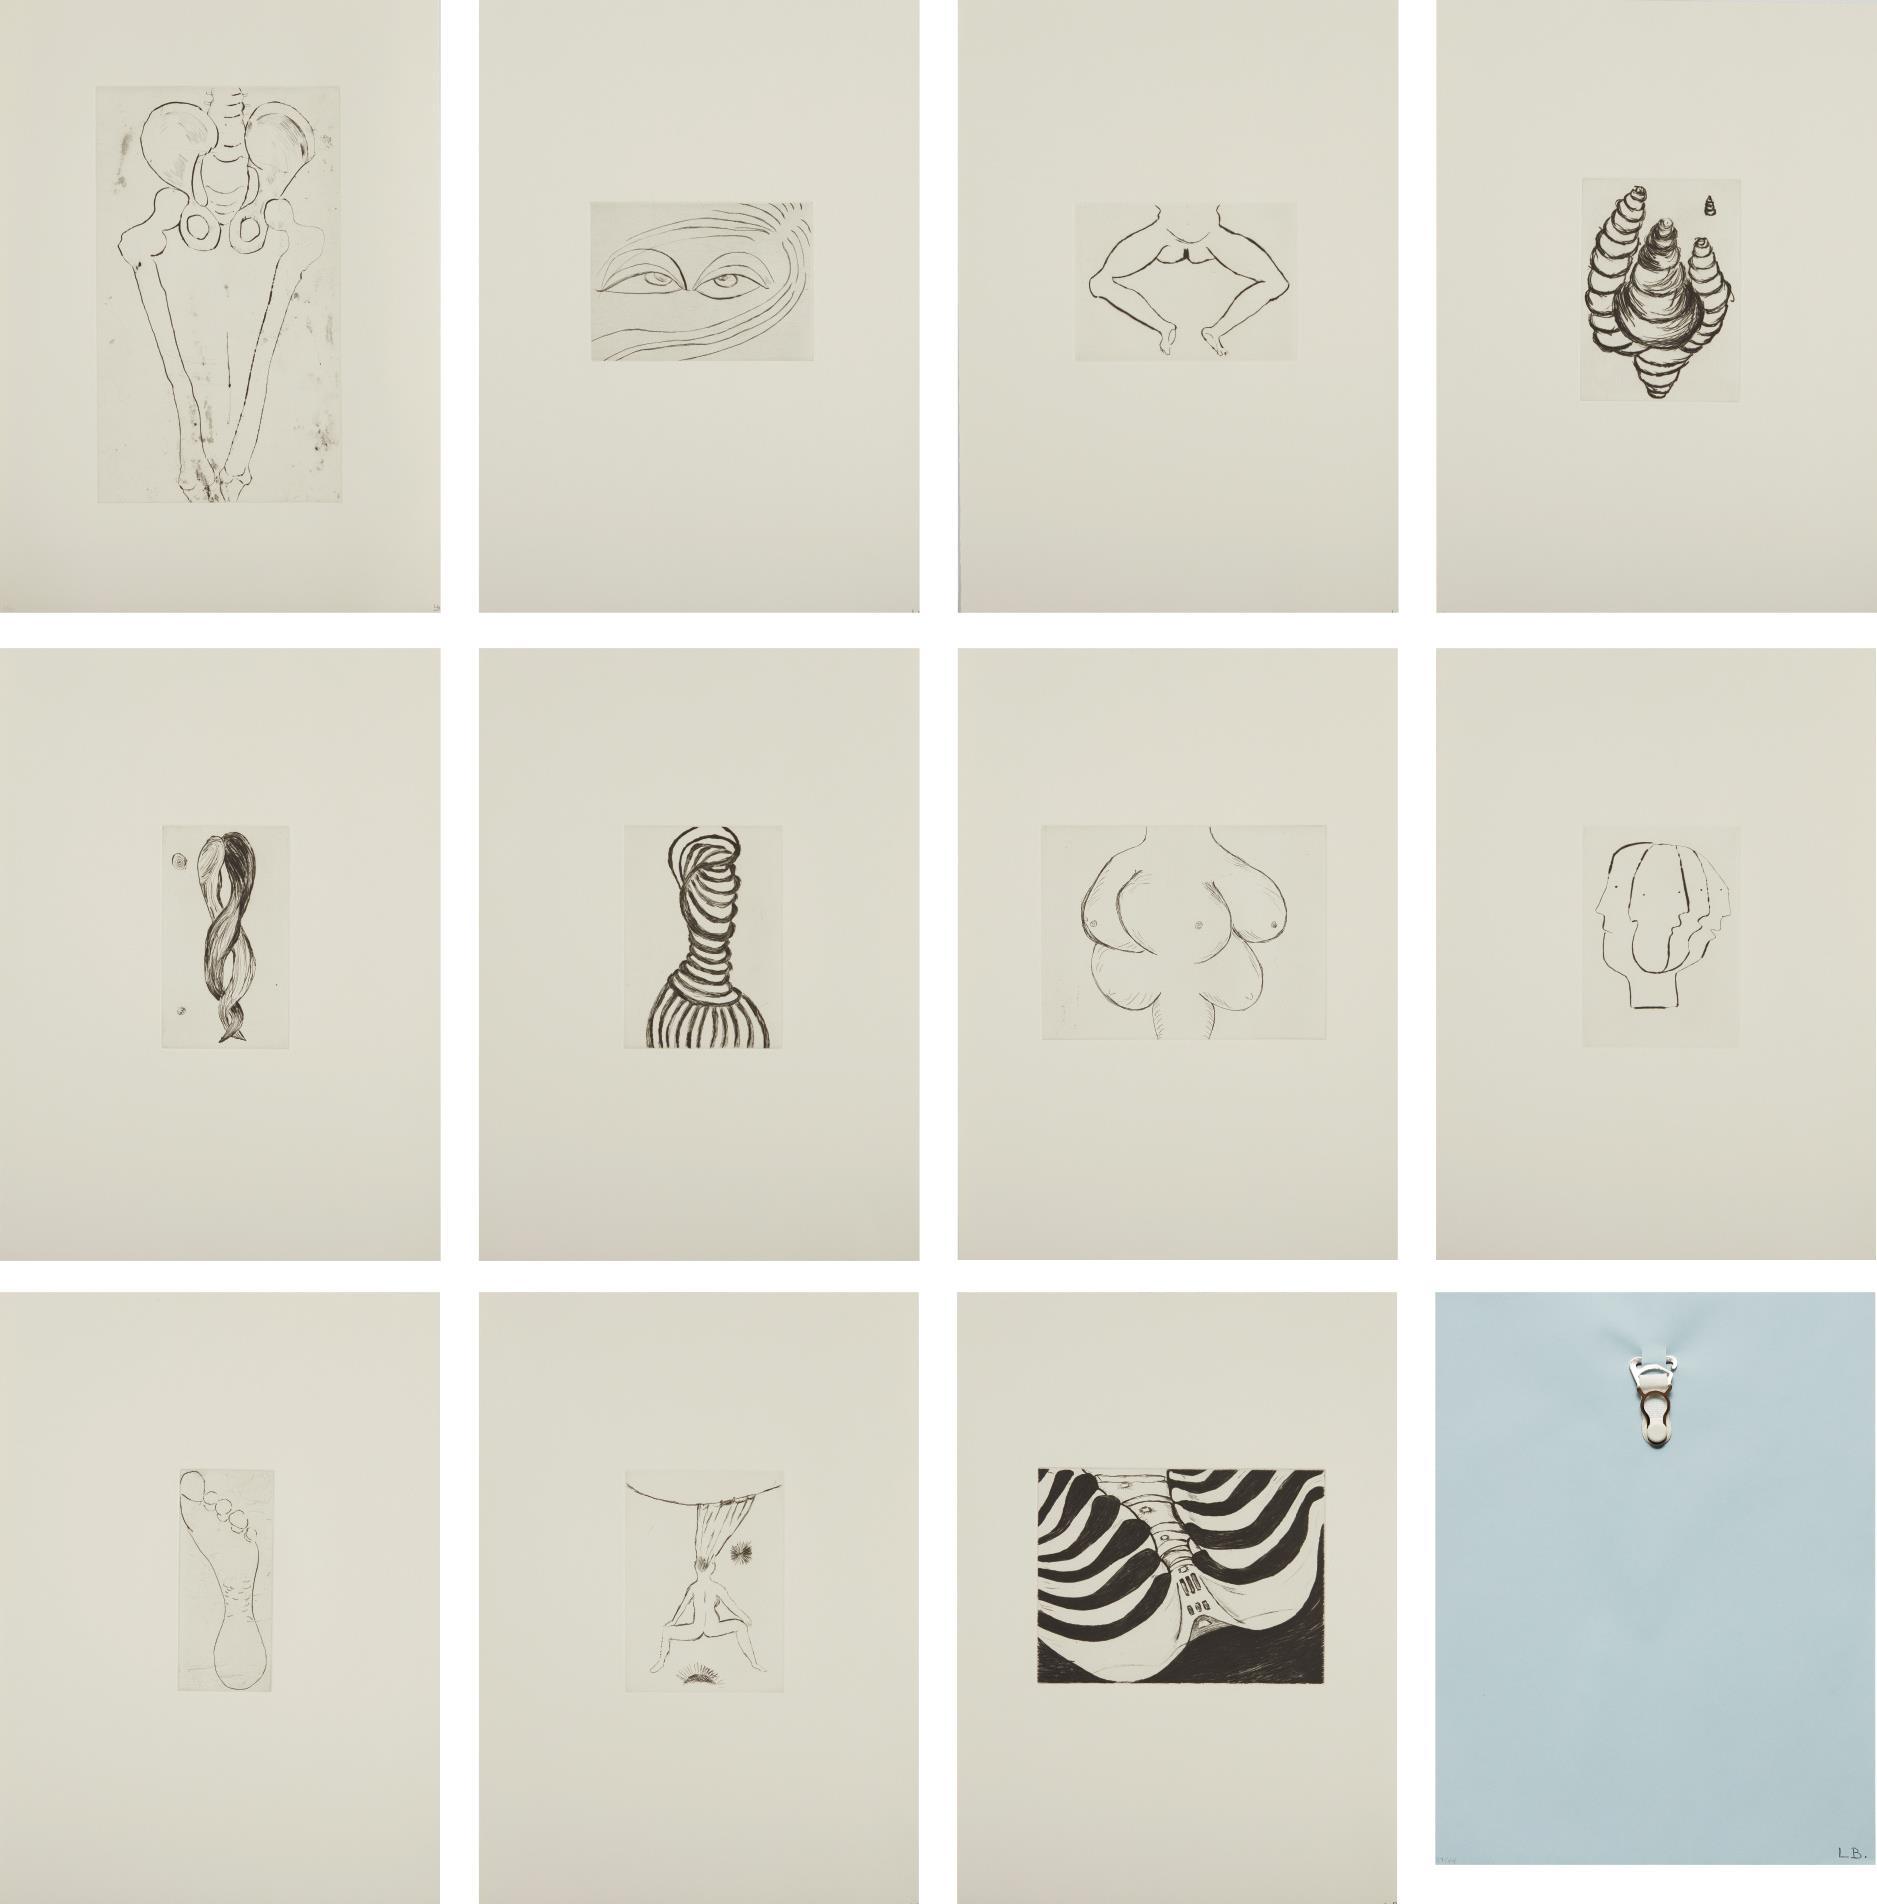 Louise Bourgeois-Anatomy-1990